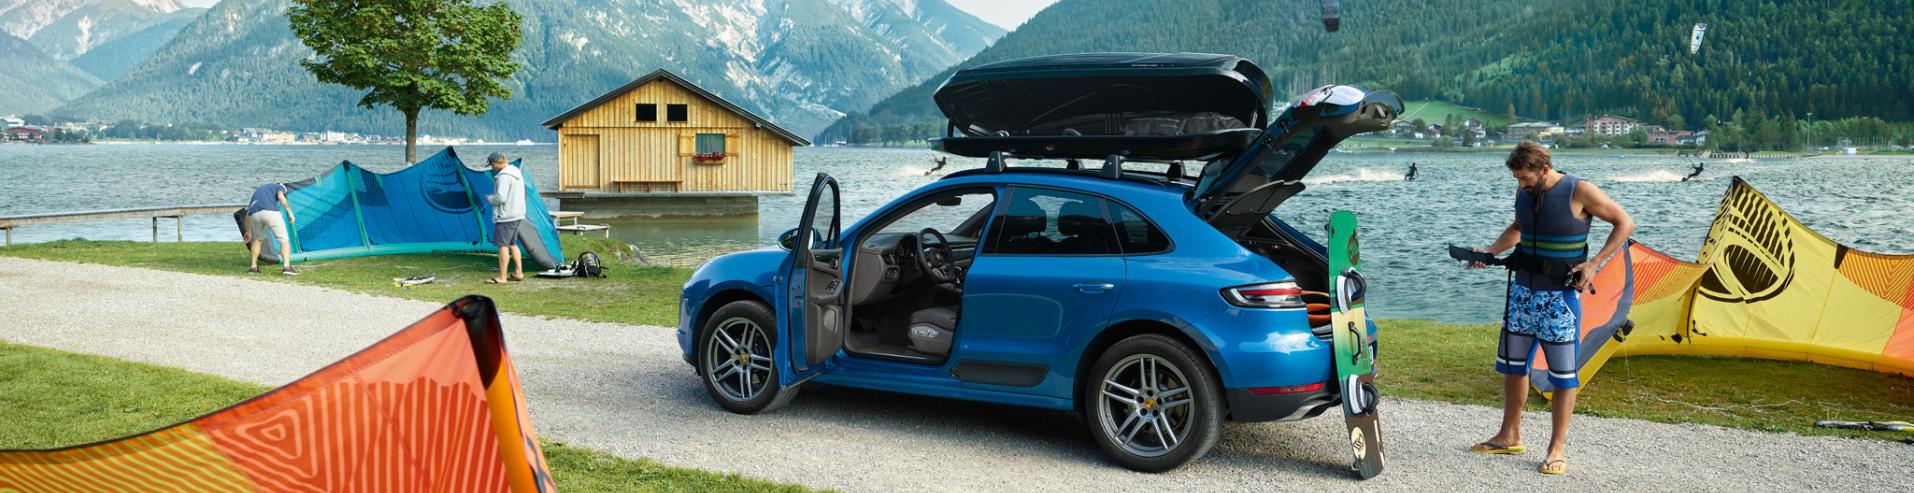 Porsche Macan Adventure